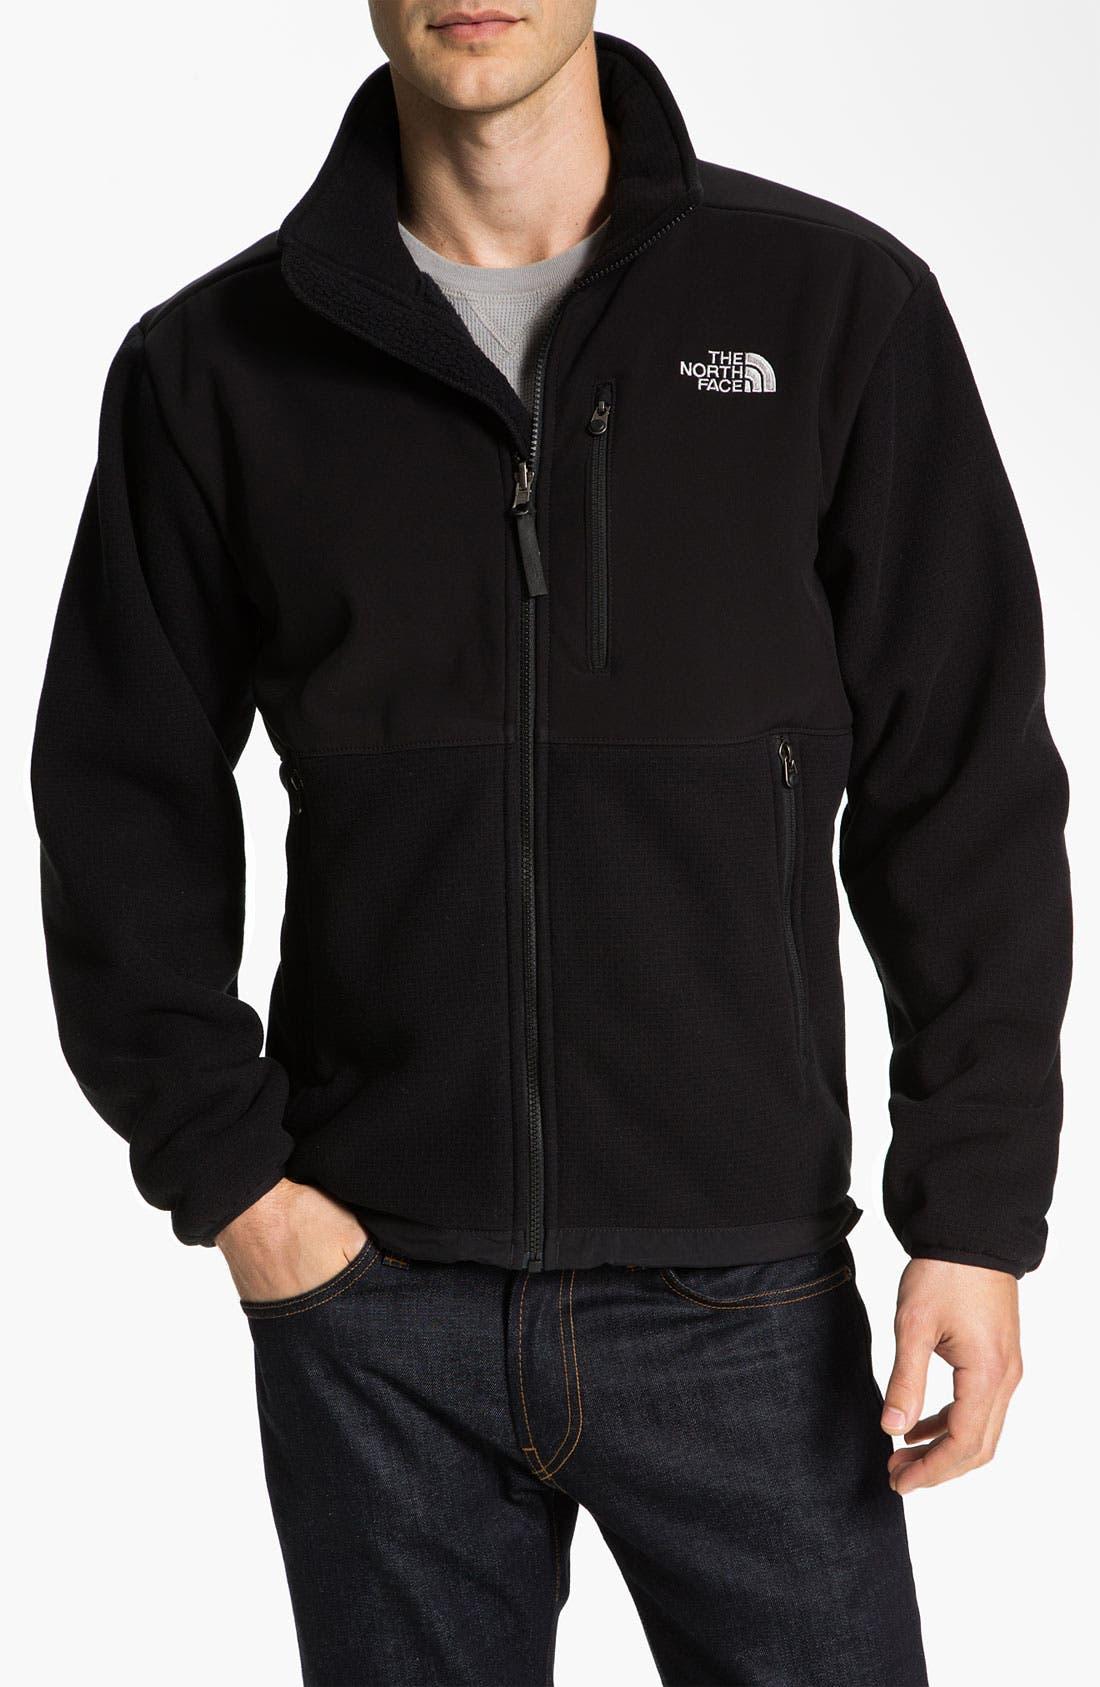 Alternate Image 1 Selected - The North Face 'Denali' Wind Pro® Jacket